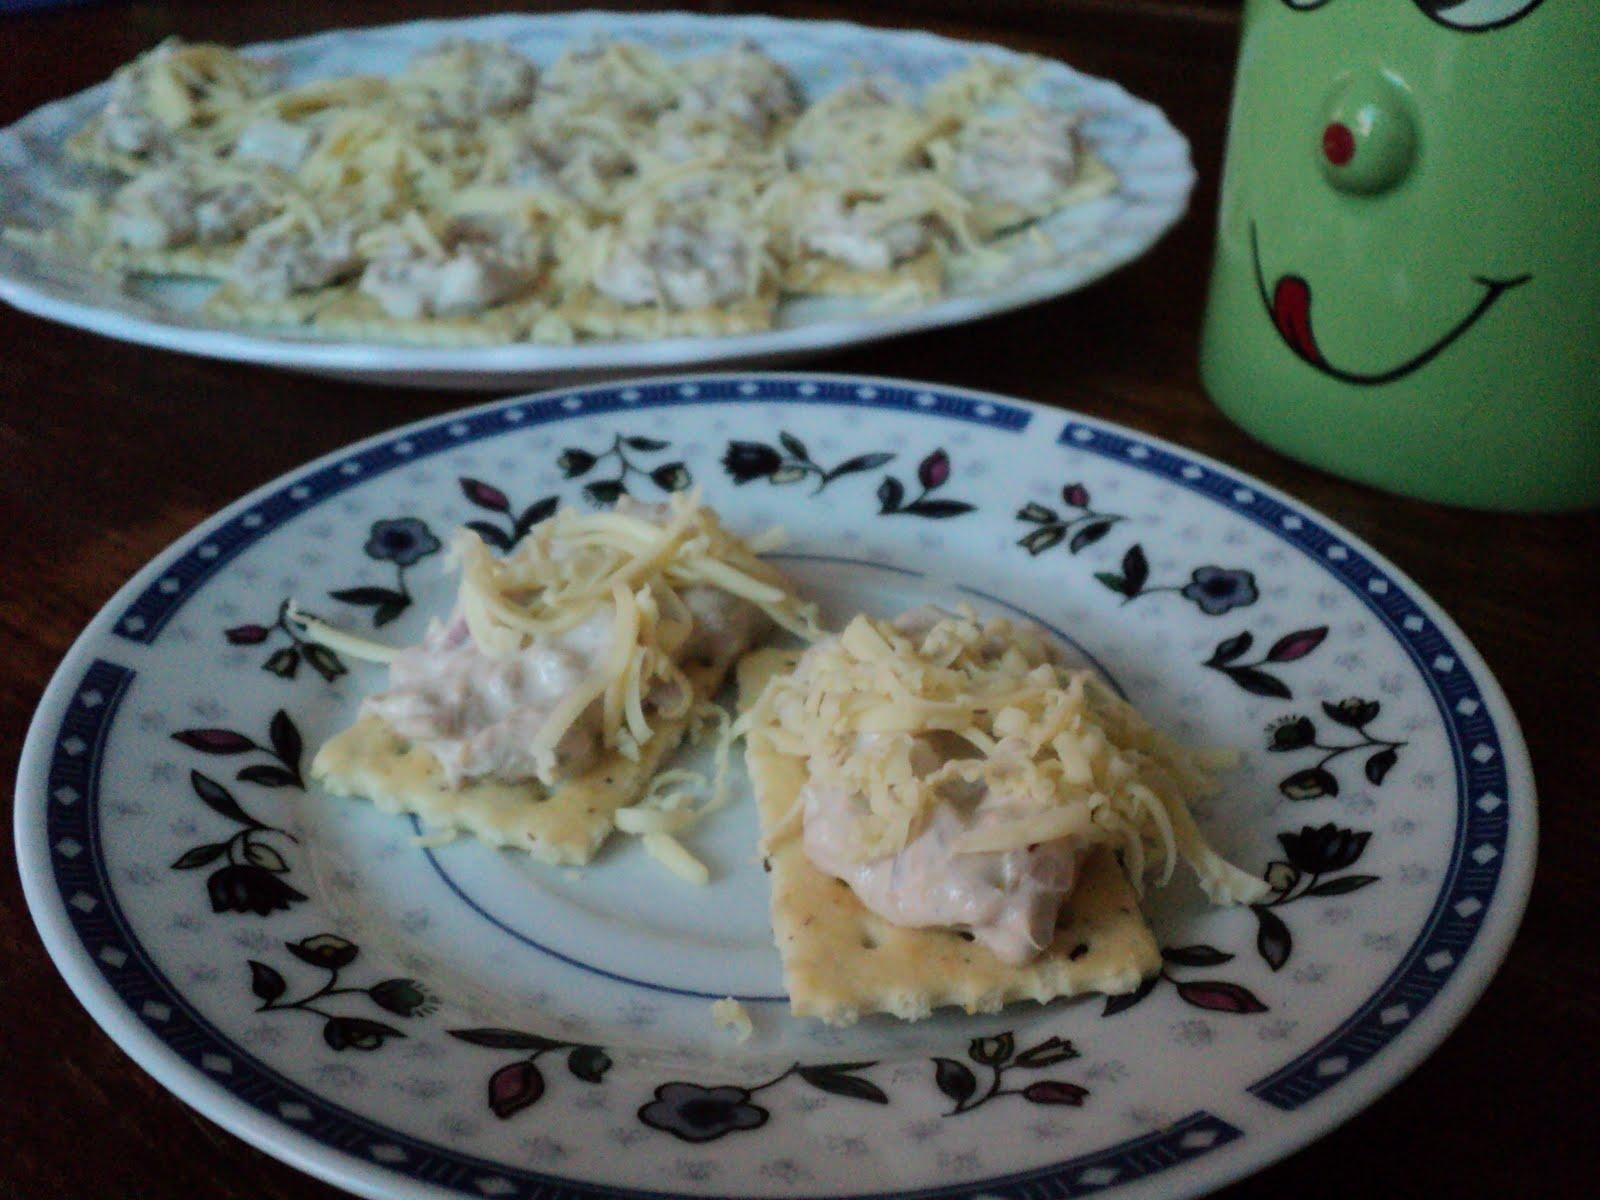 tuna on crackers